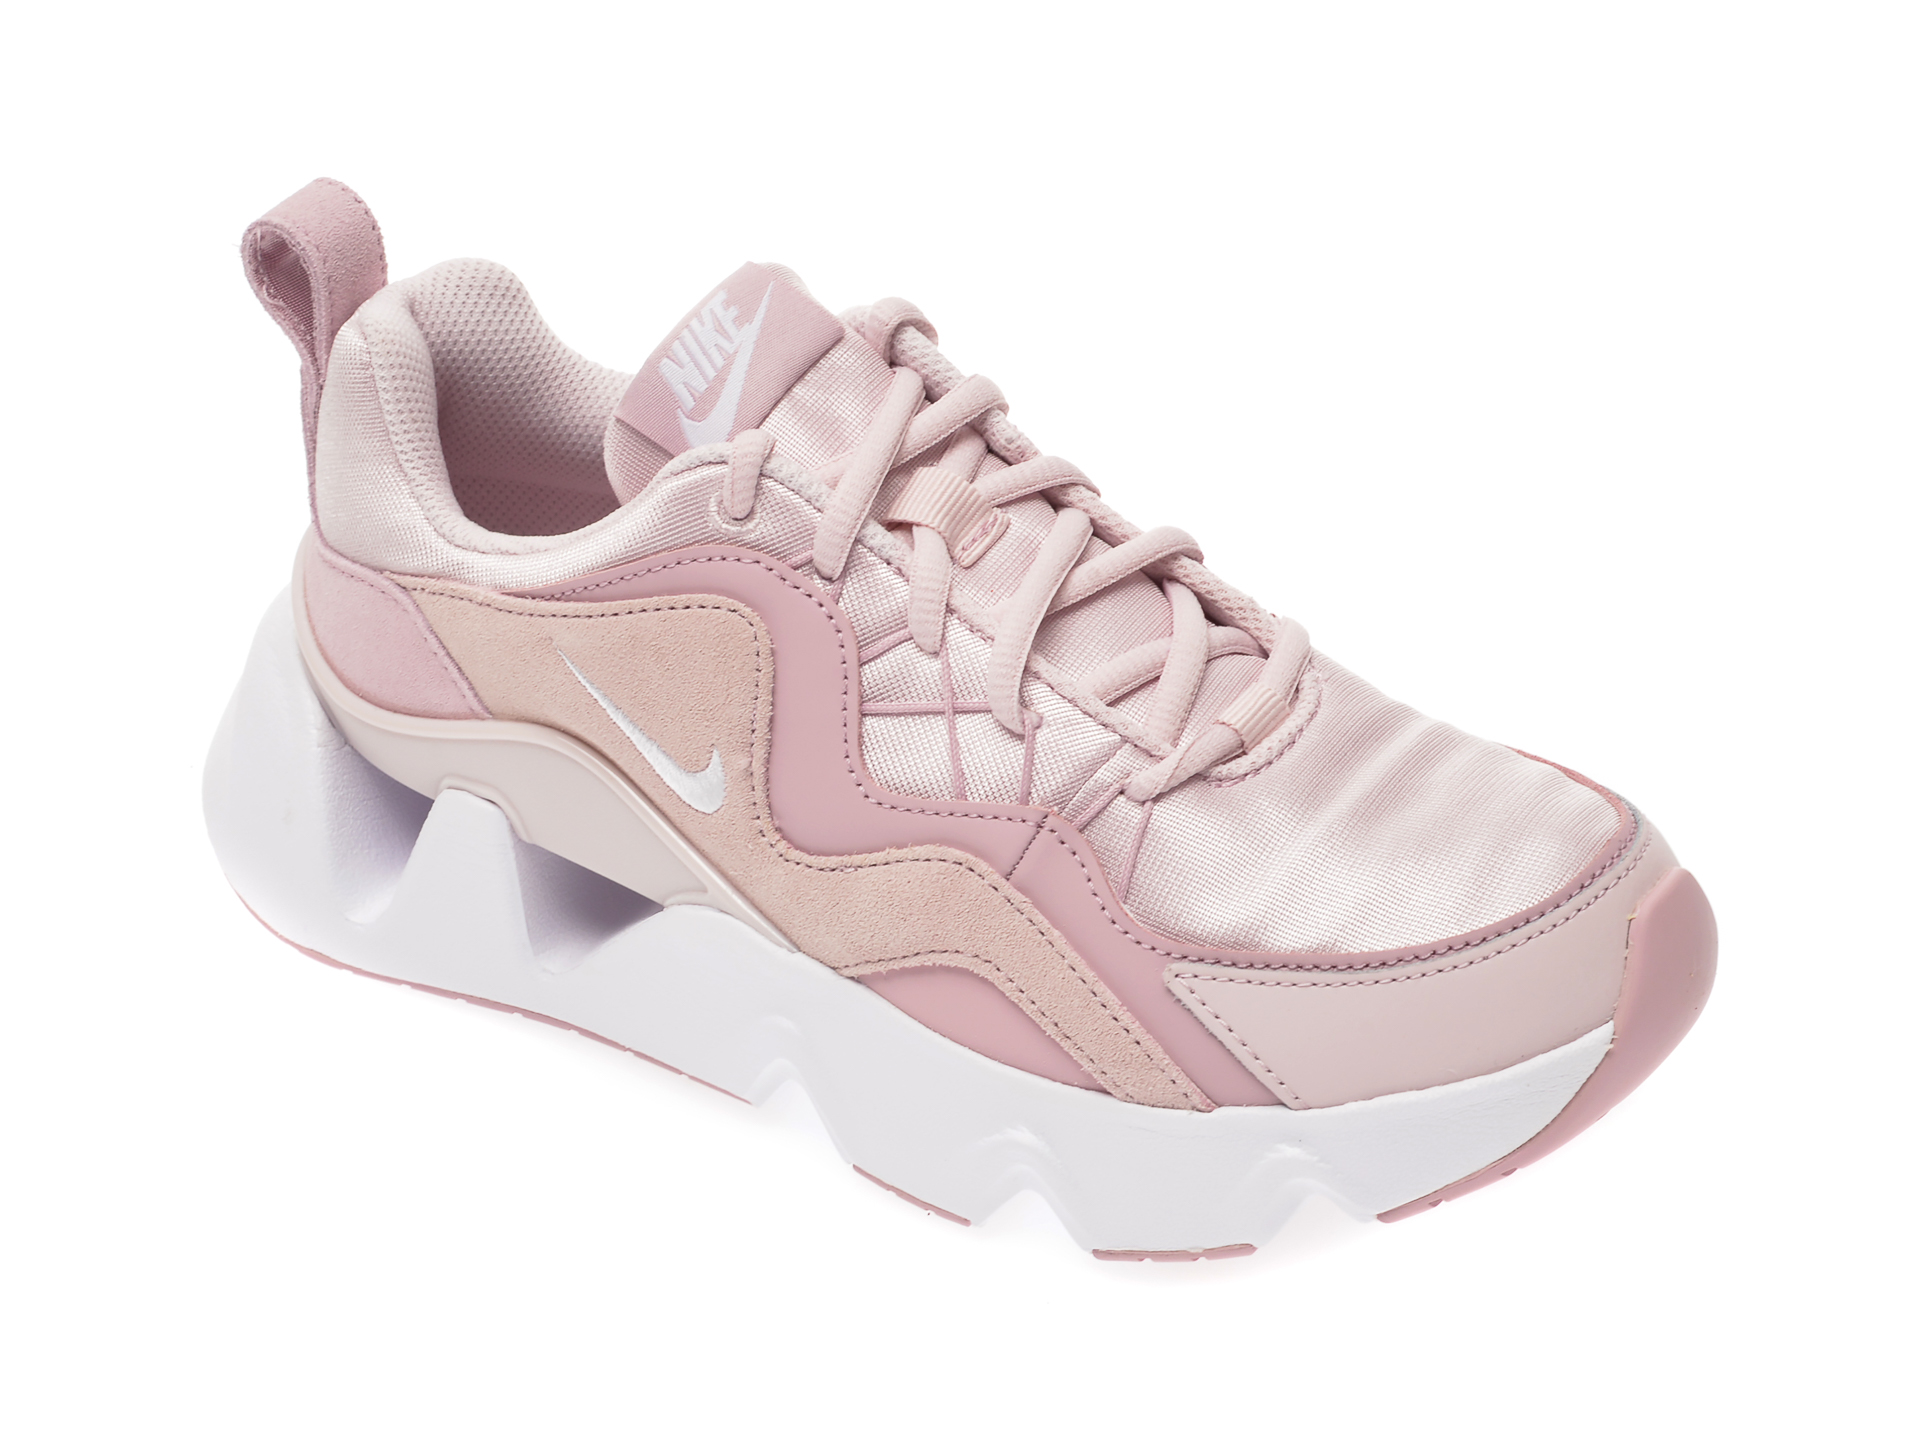 Pantofi sport NIKE roz, Uptear, din material textil si piele intoarsa